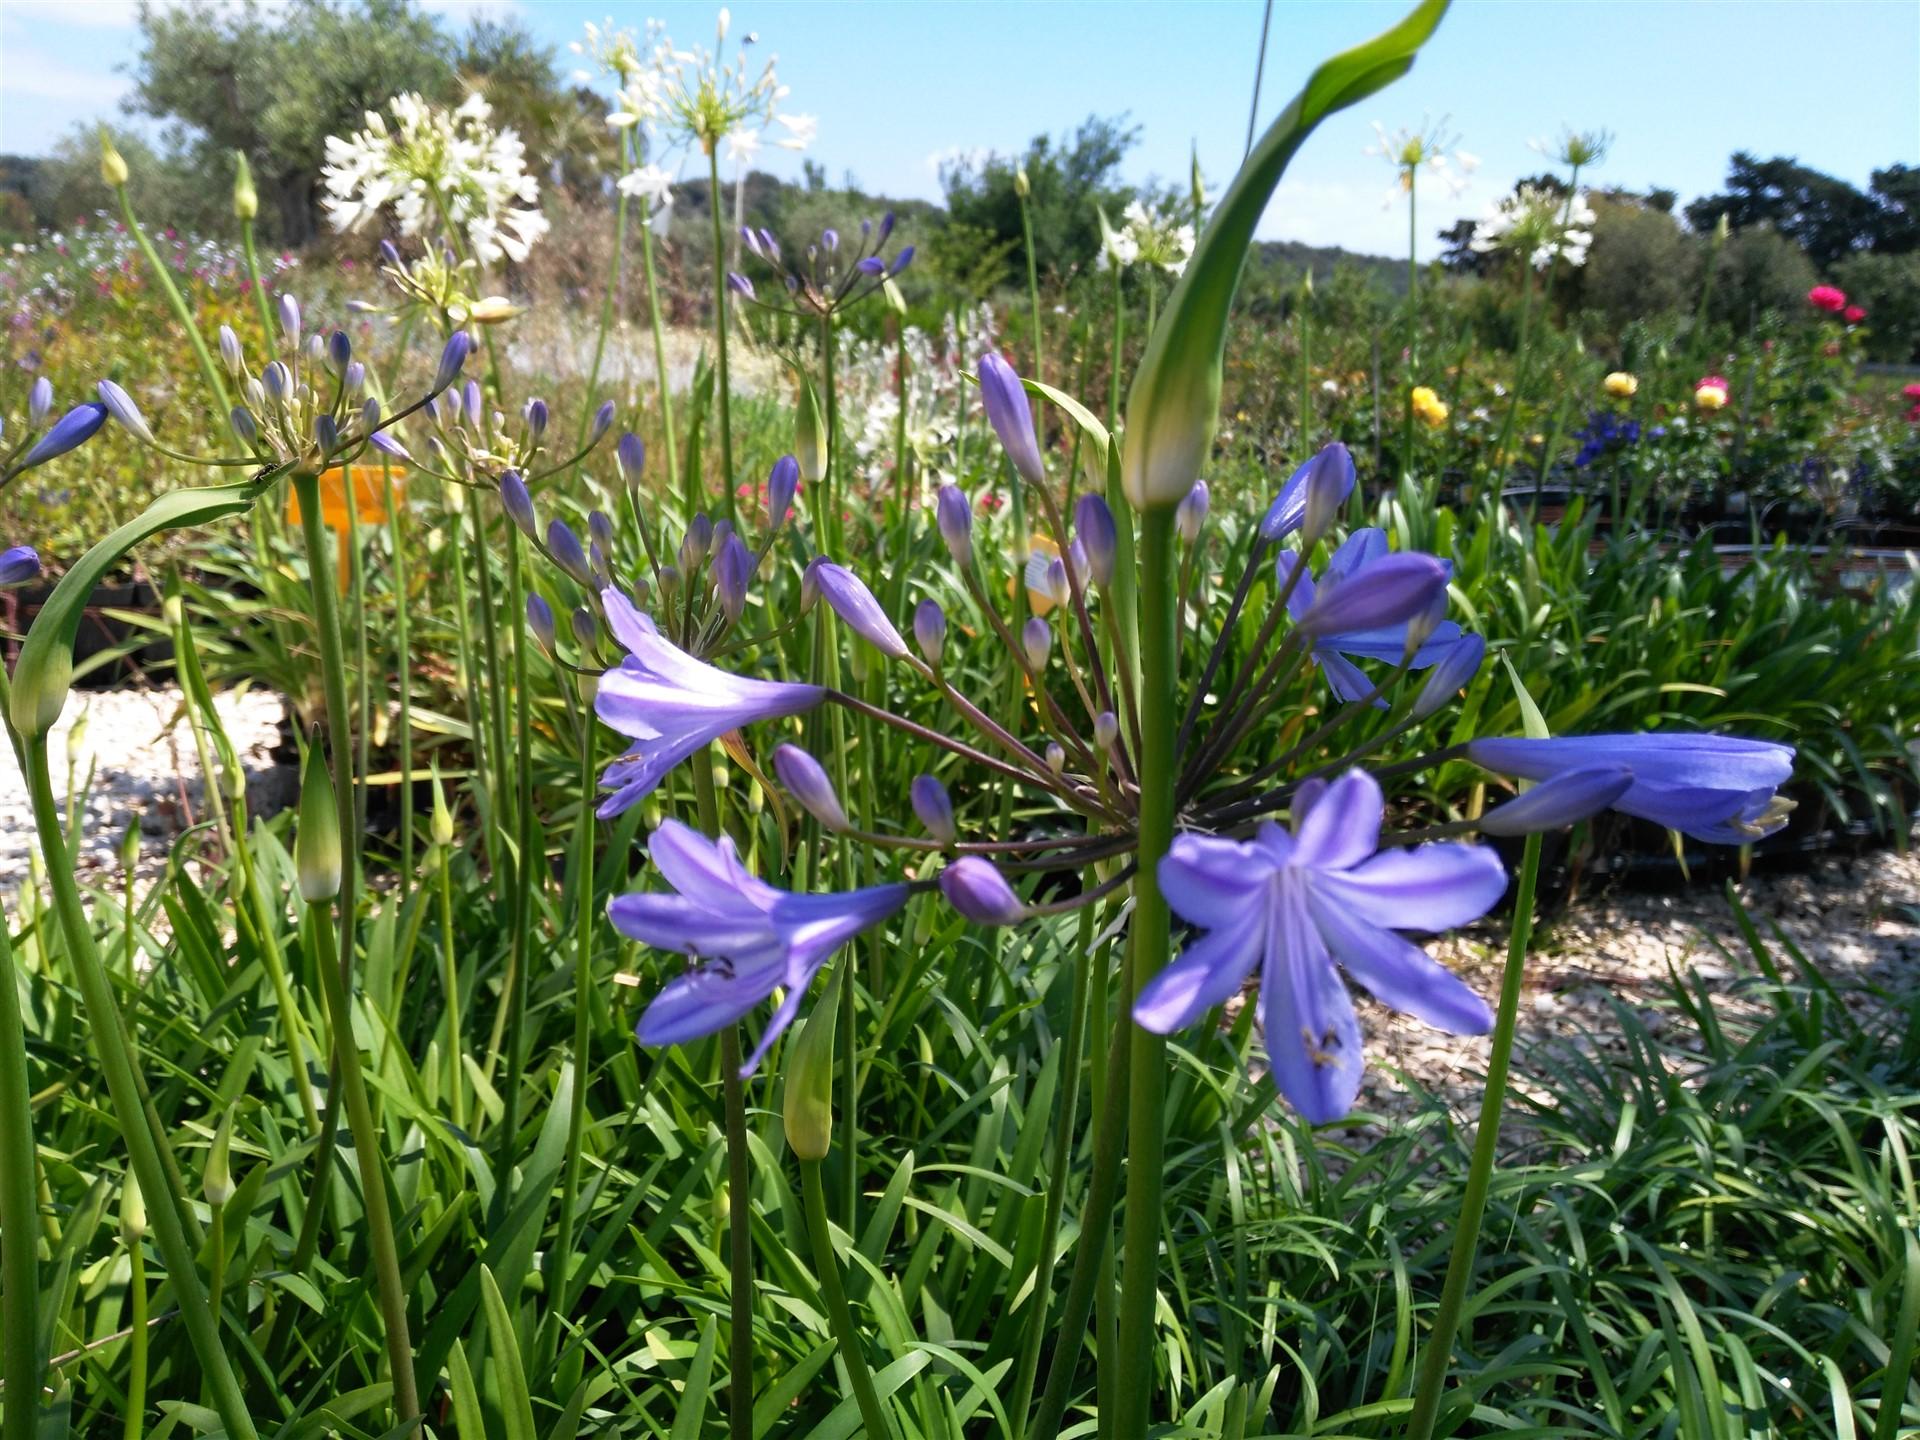 fiori agapanthus blu vivaio orosei